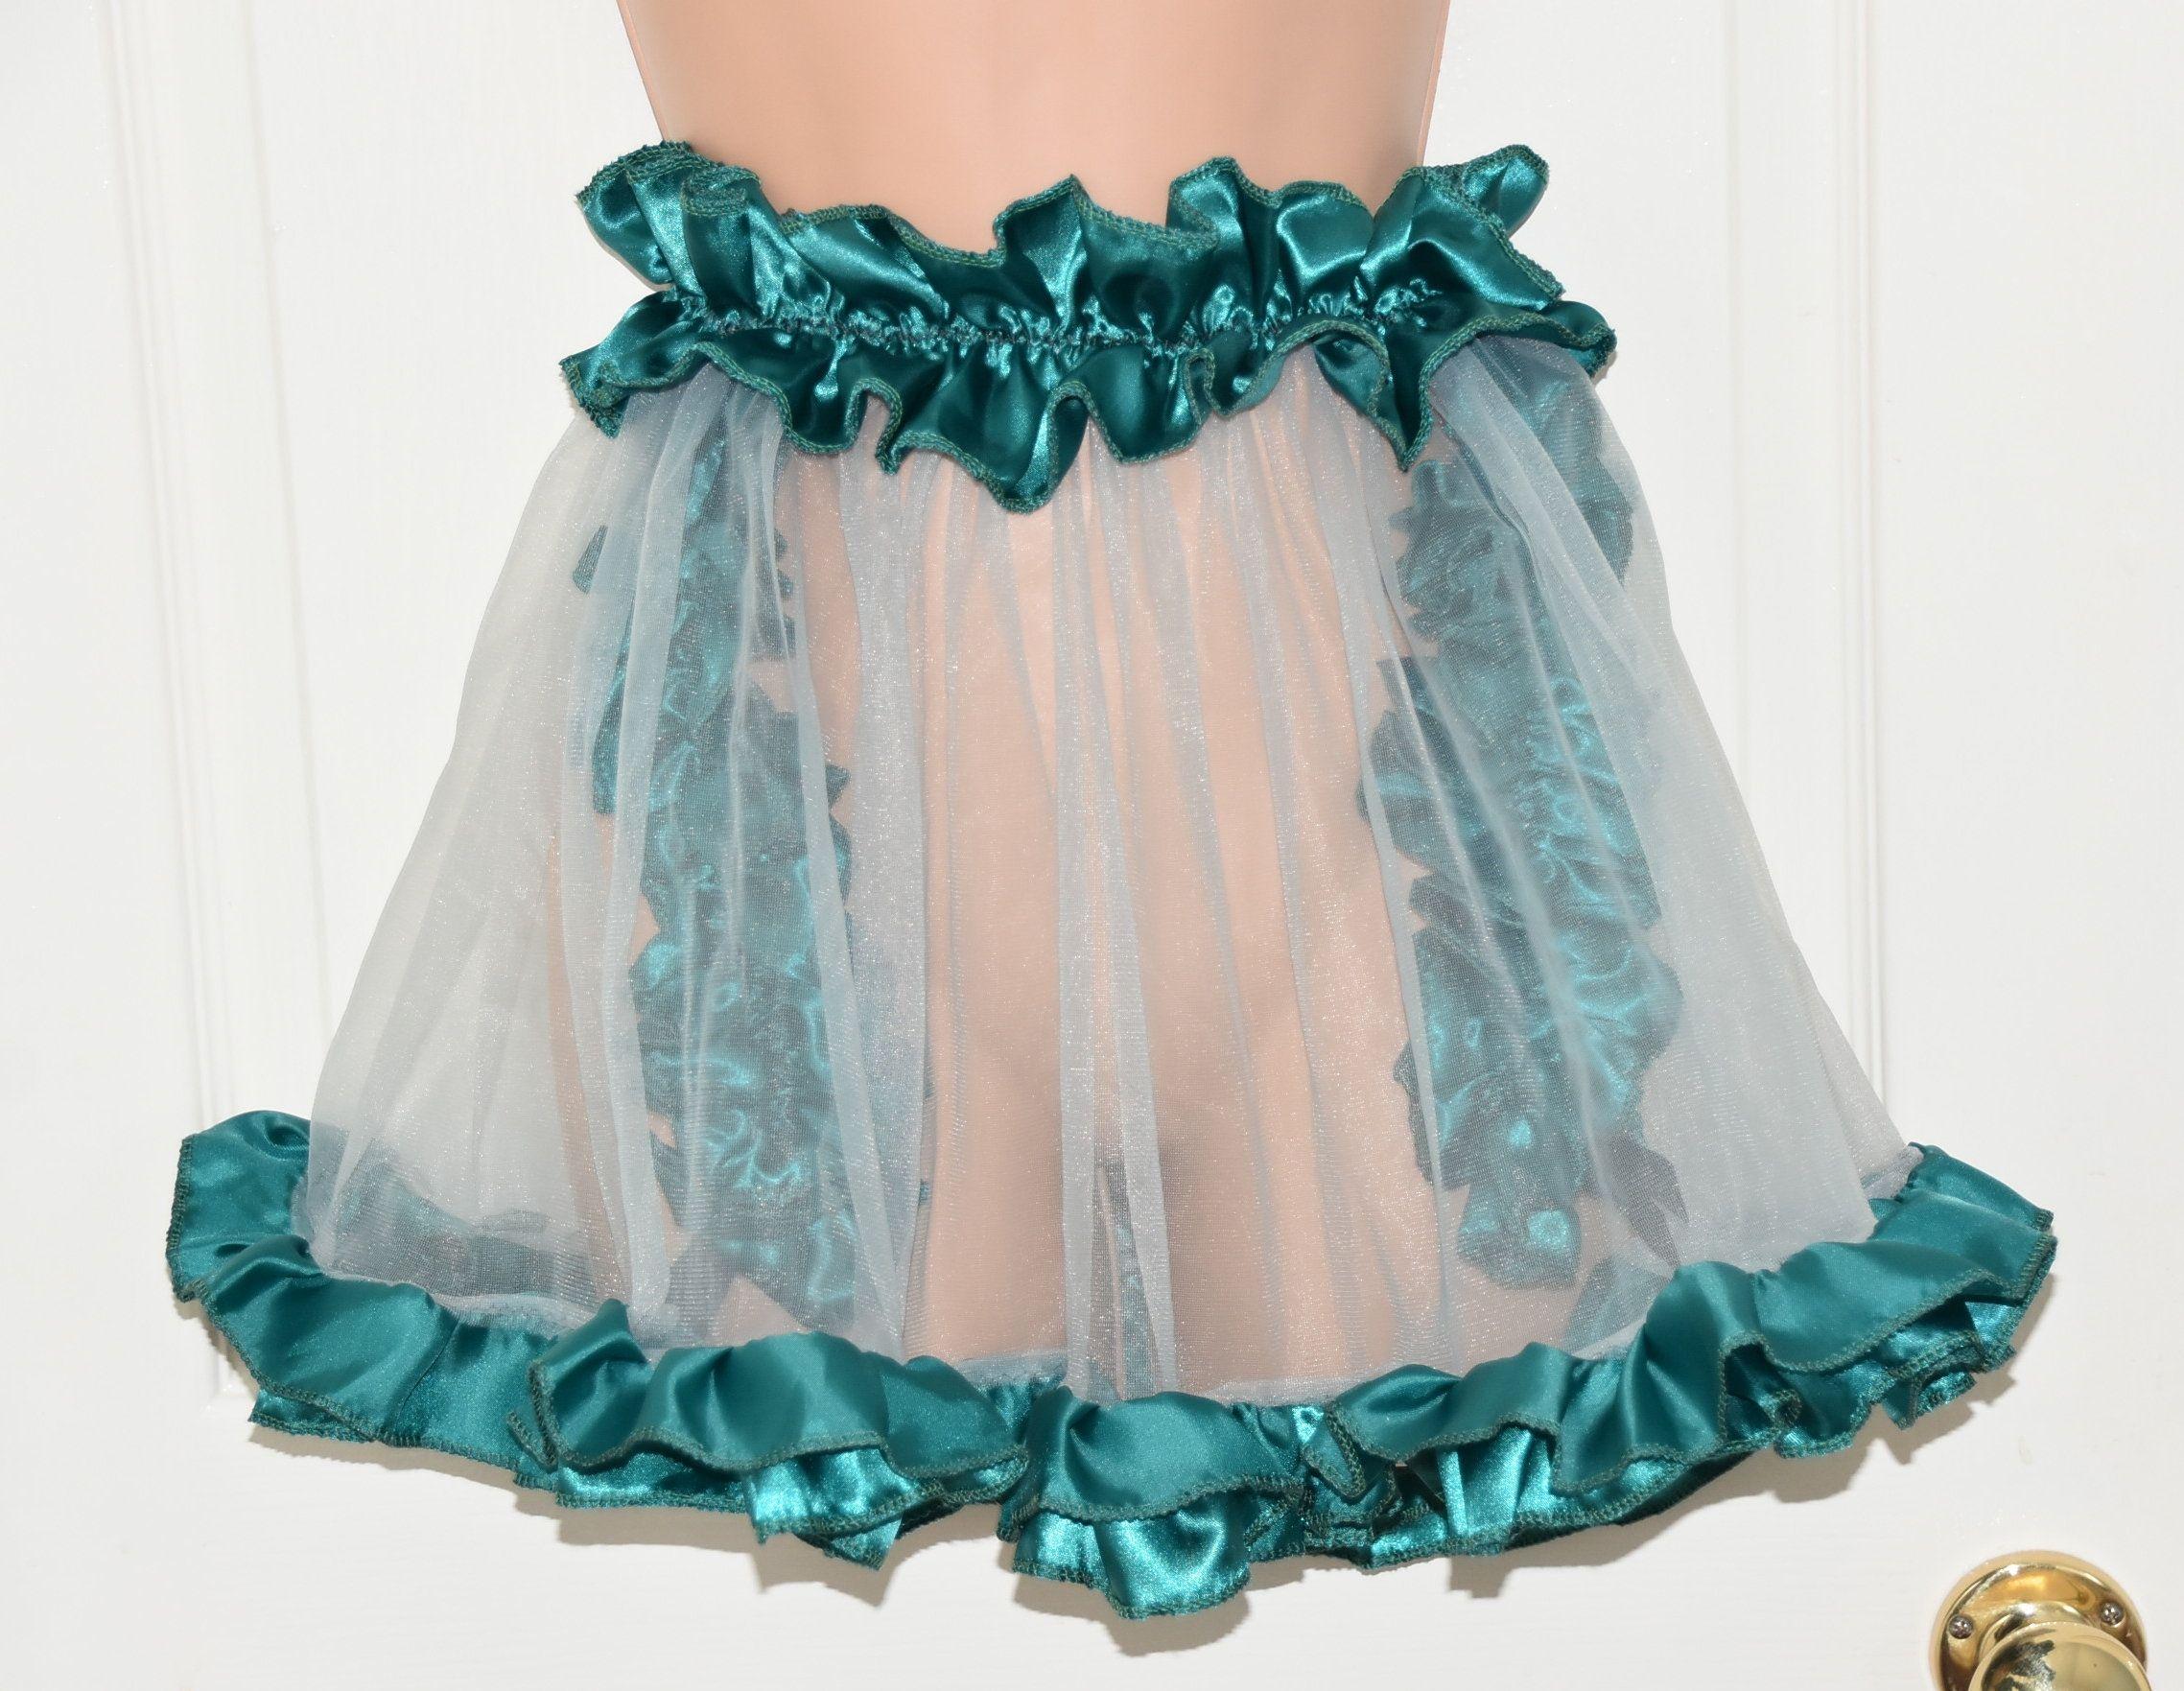 Sissy Lingerie JS Gorgeous Sissy Delight silky white satin nightdress babydoll sissy nightdress